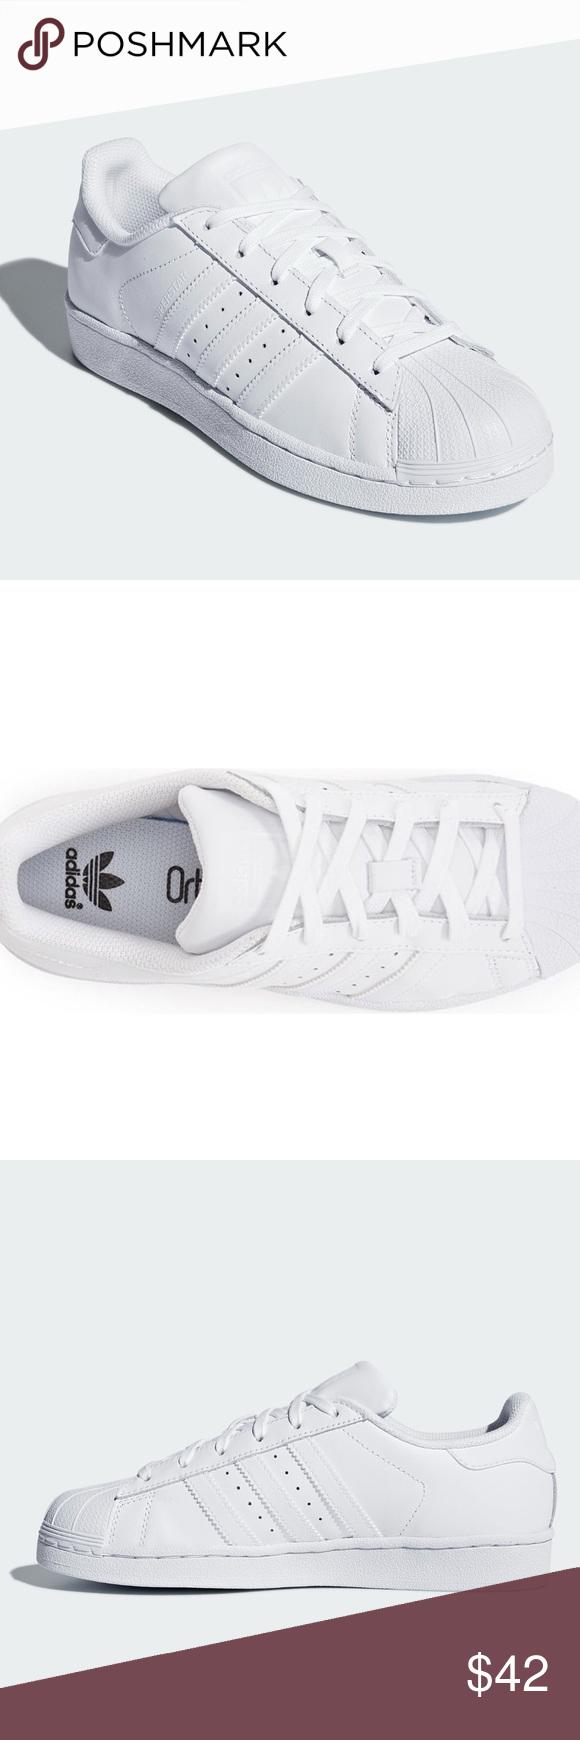 adidas Superstar Superstar 19061 Sneakers | | 2c4b585 - generiskmedicin.website